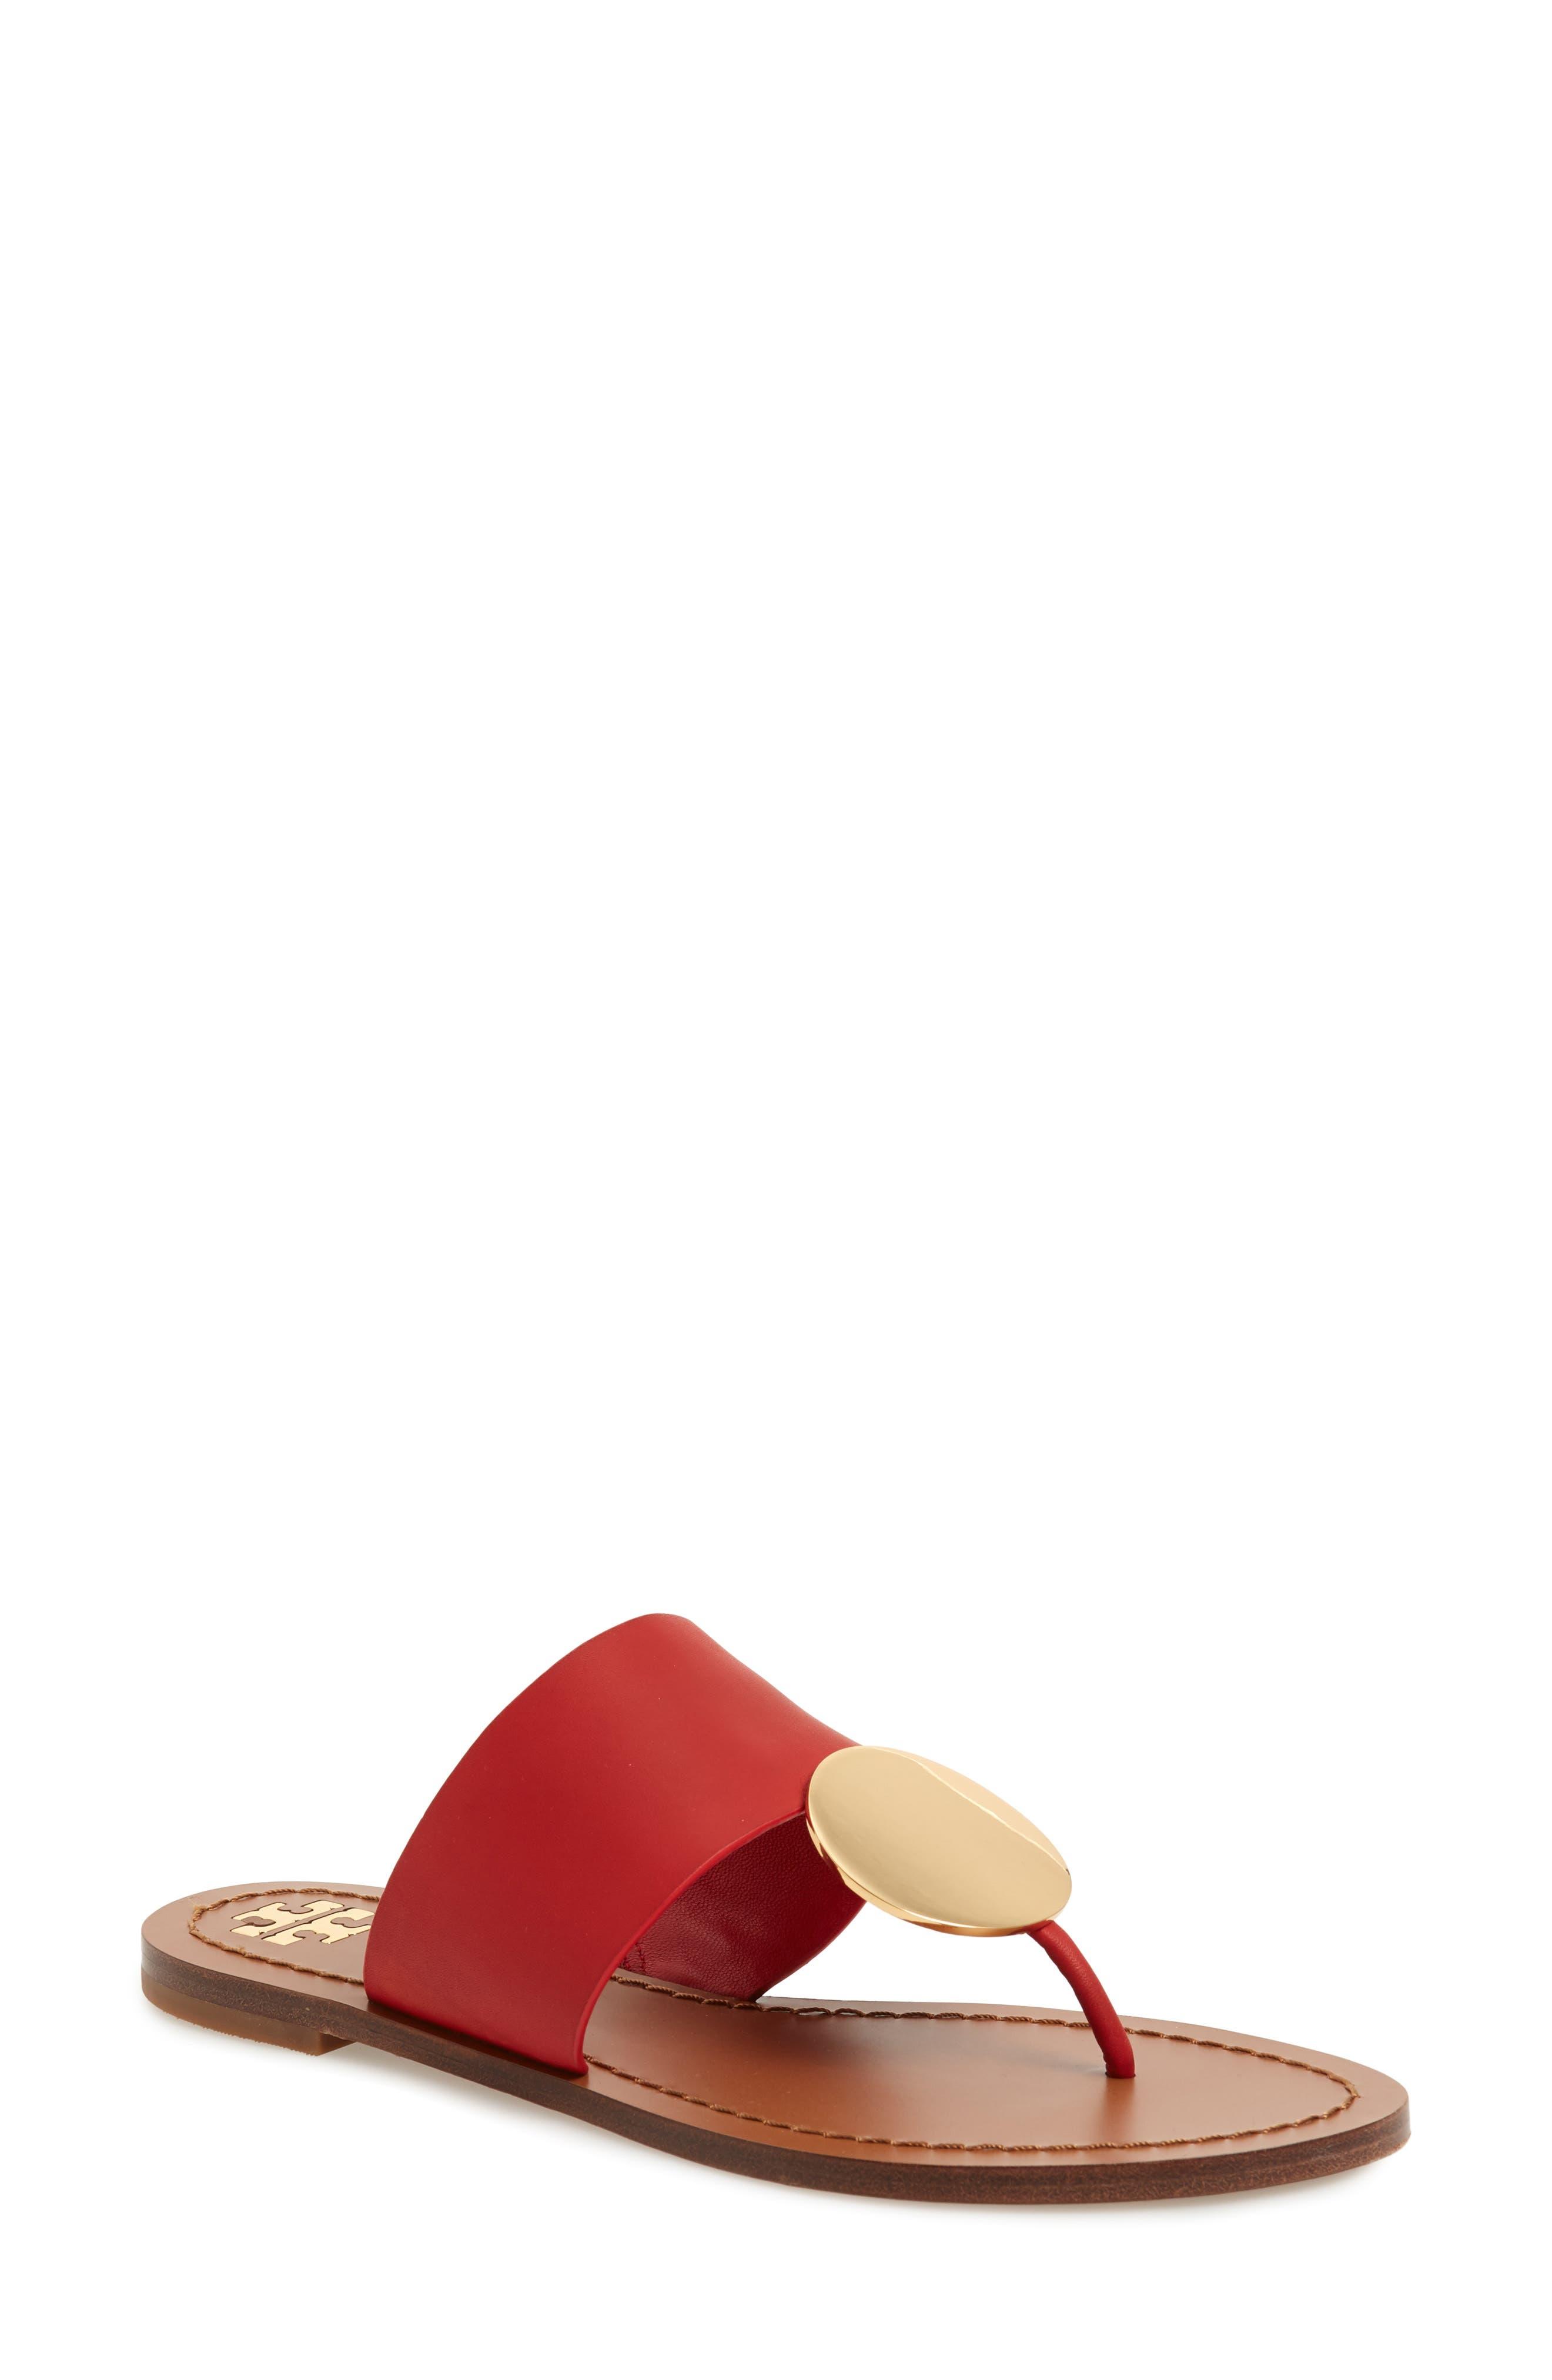 Tory Burch Patos Sandal- Red